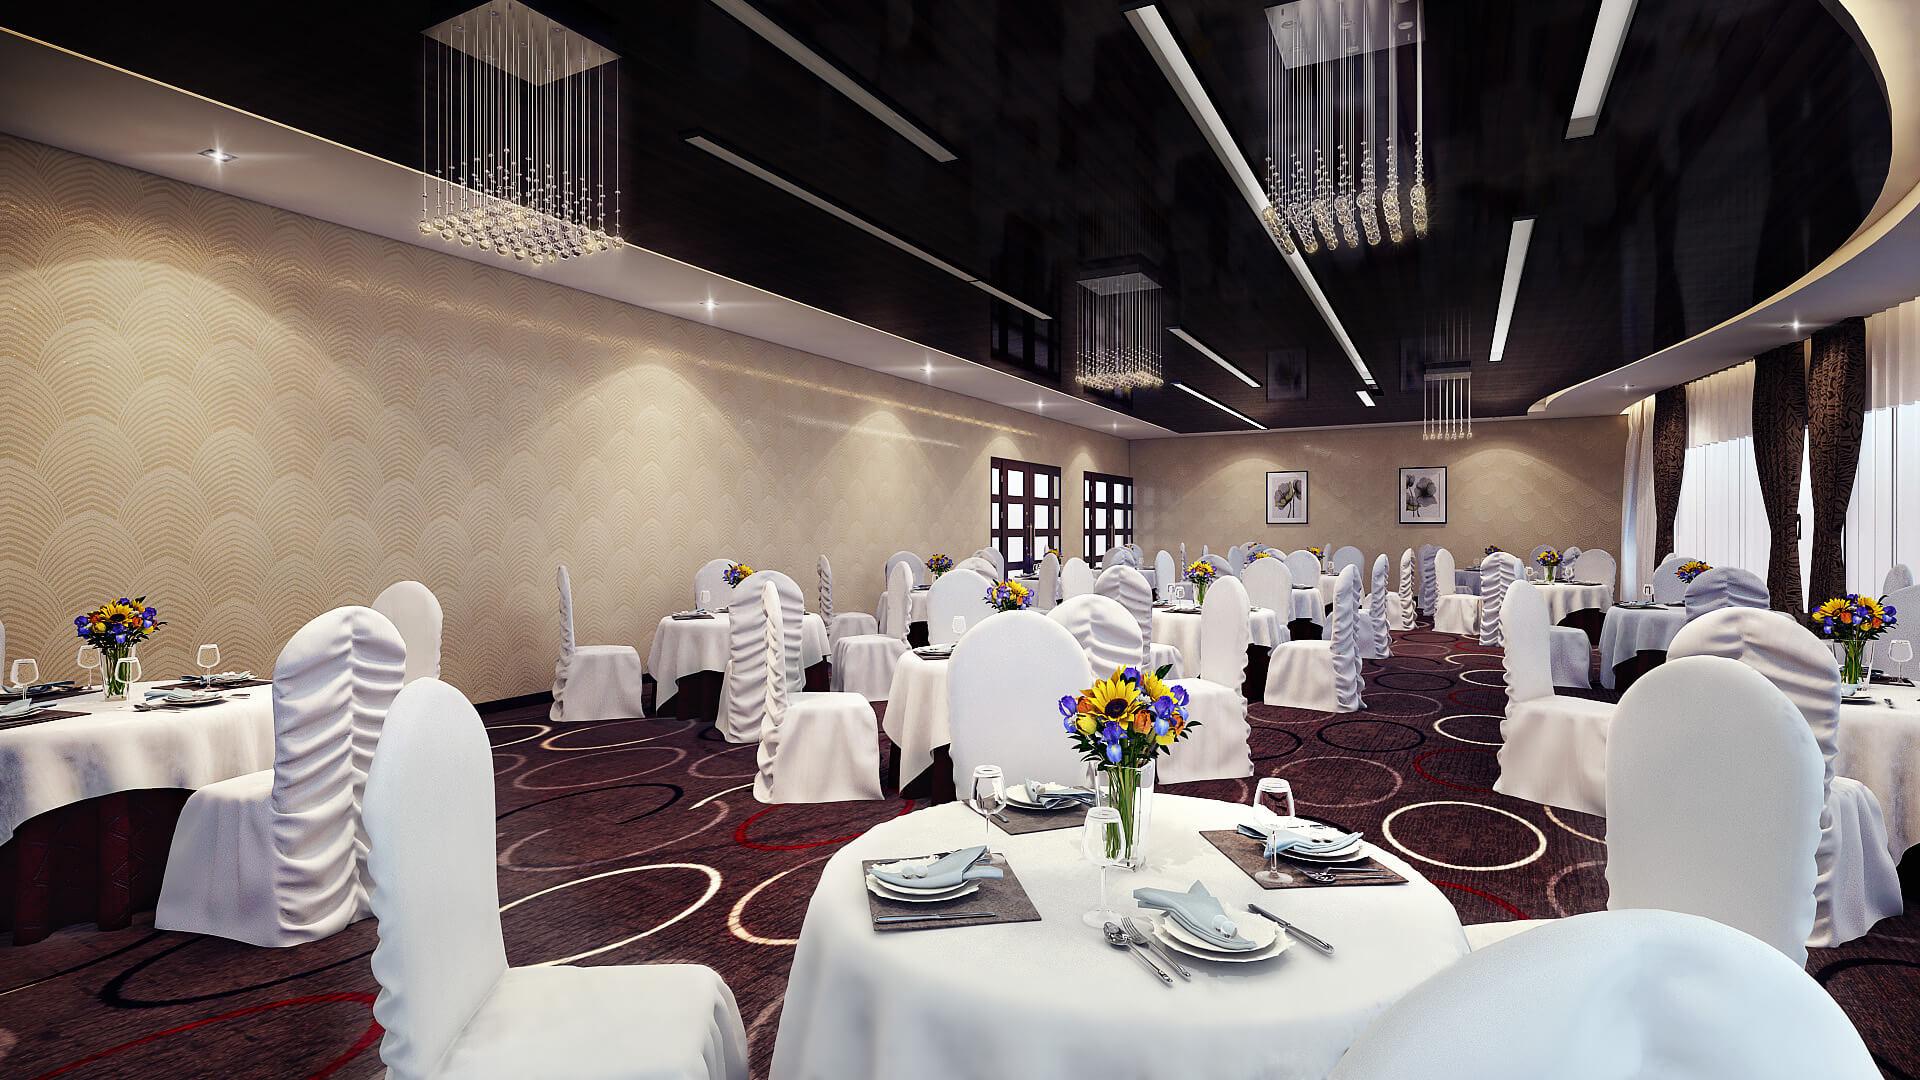 3d Banquet Hall Interior Design